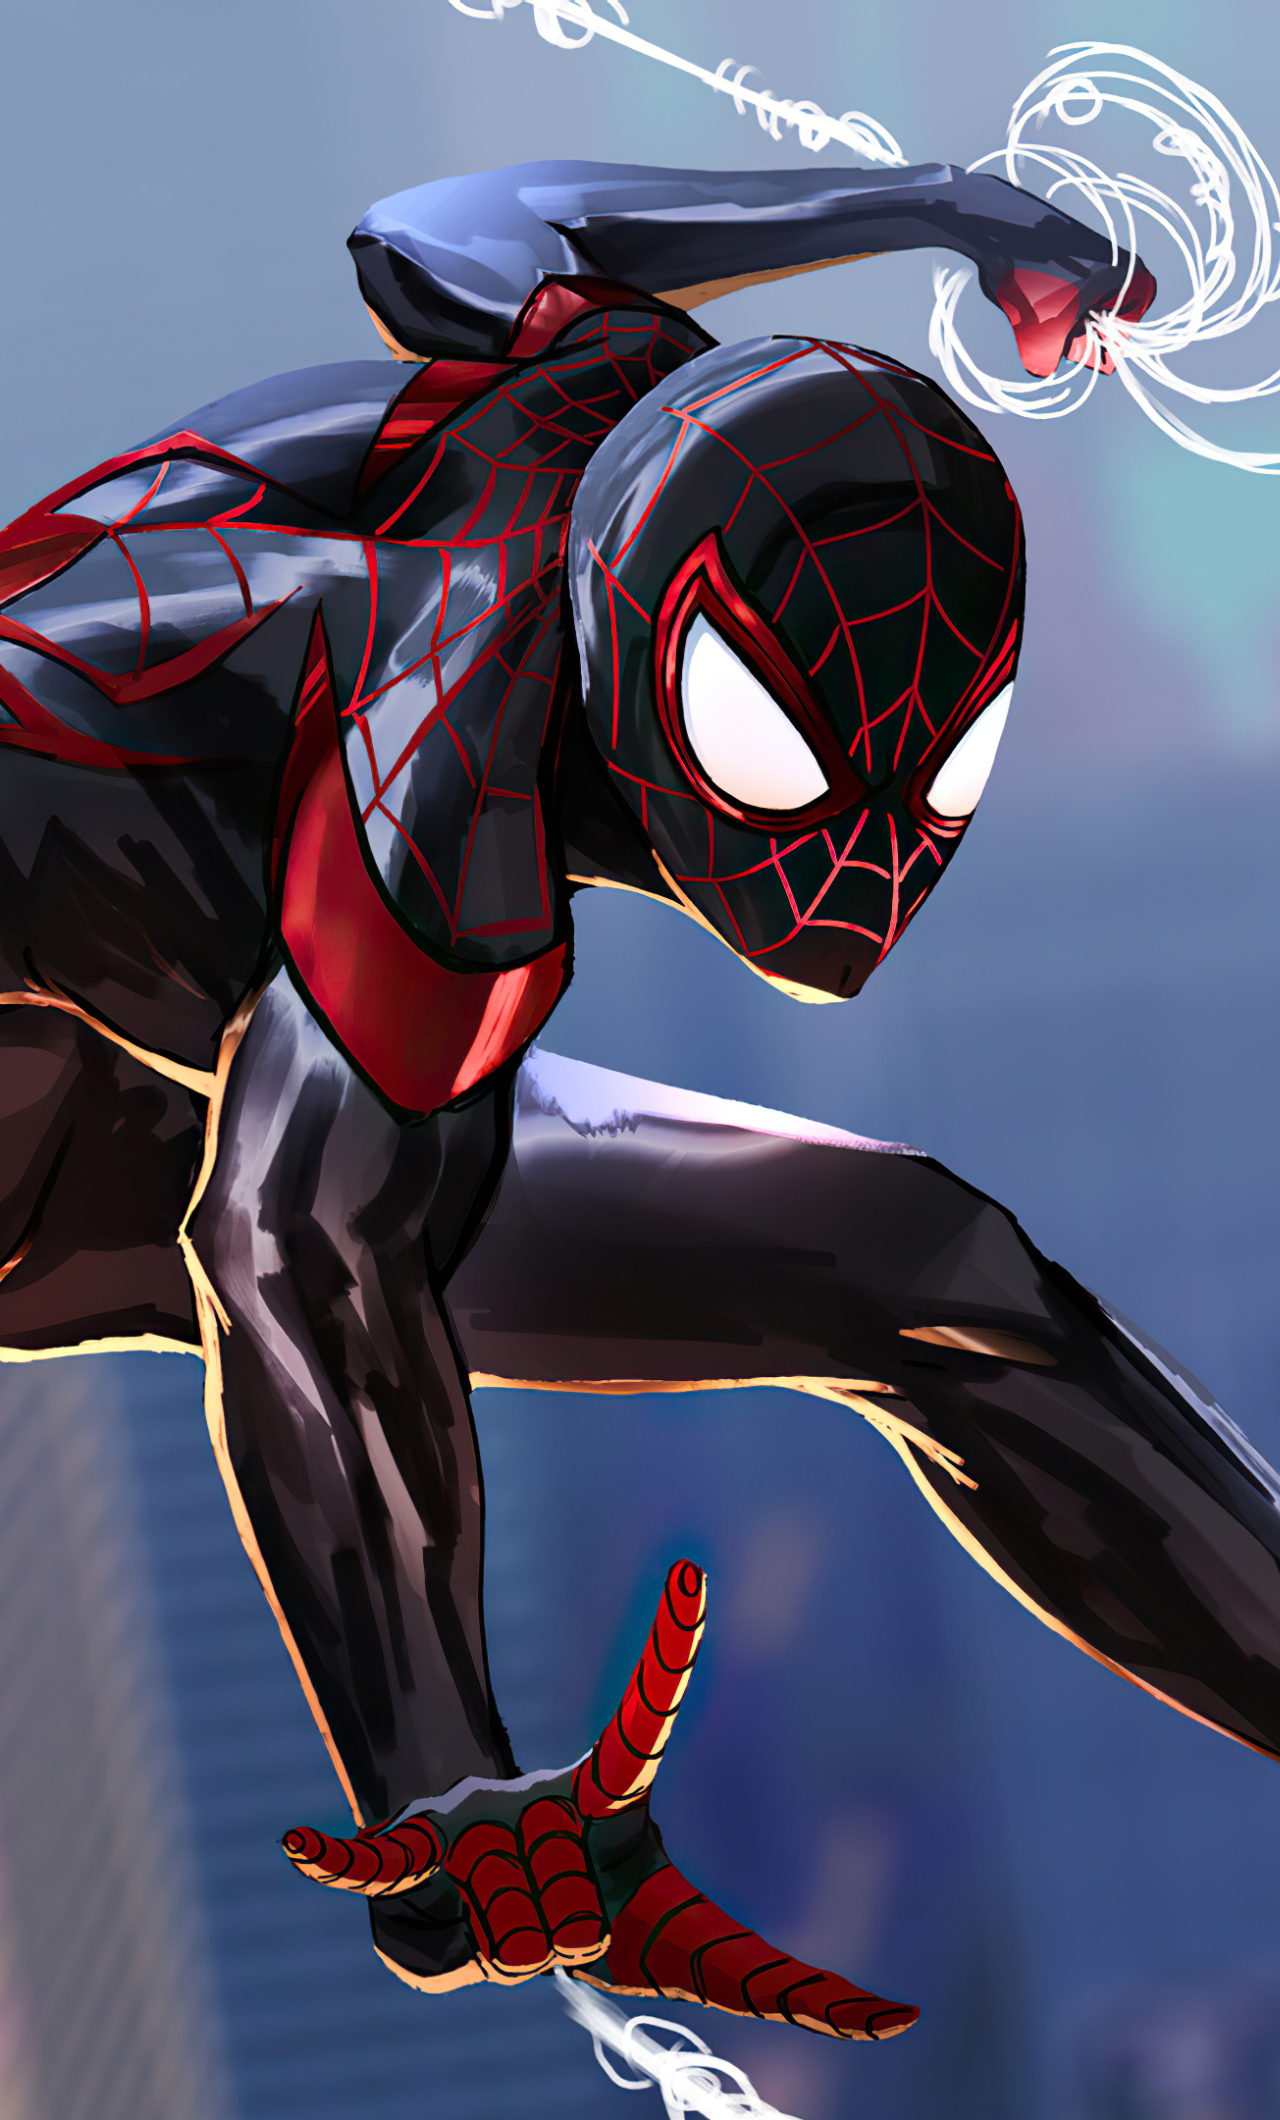 1280x2120 Spider-Man 2 Into The Spider-Verse Art iPhone 6 ...